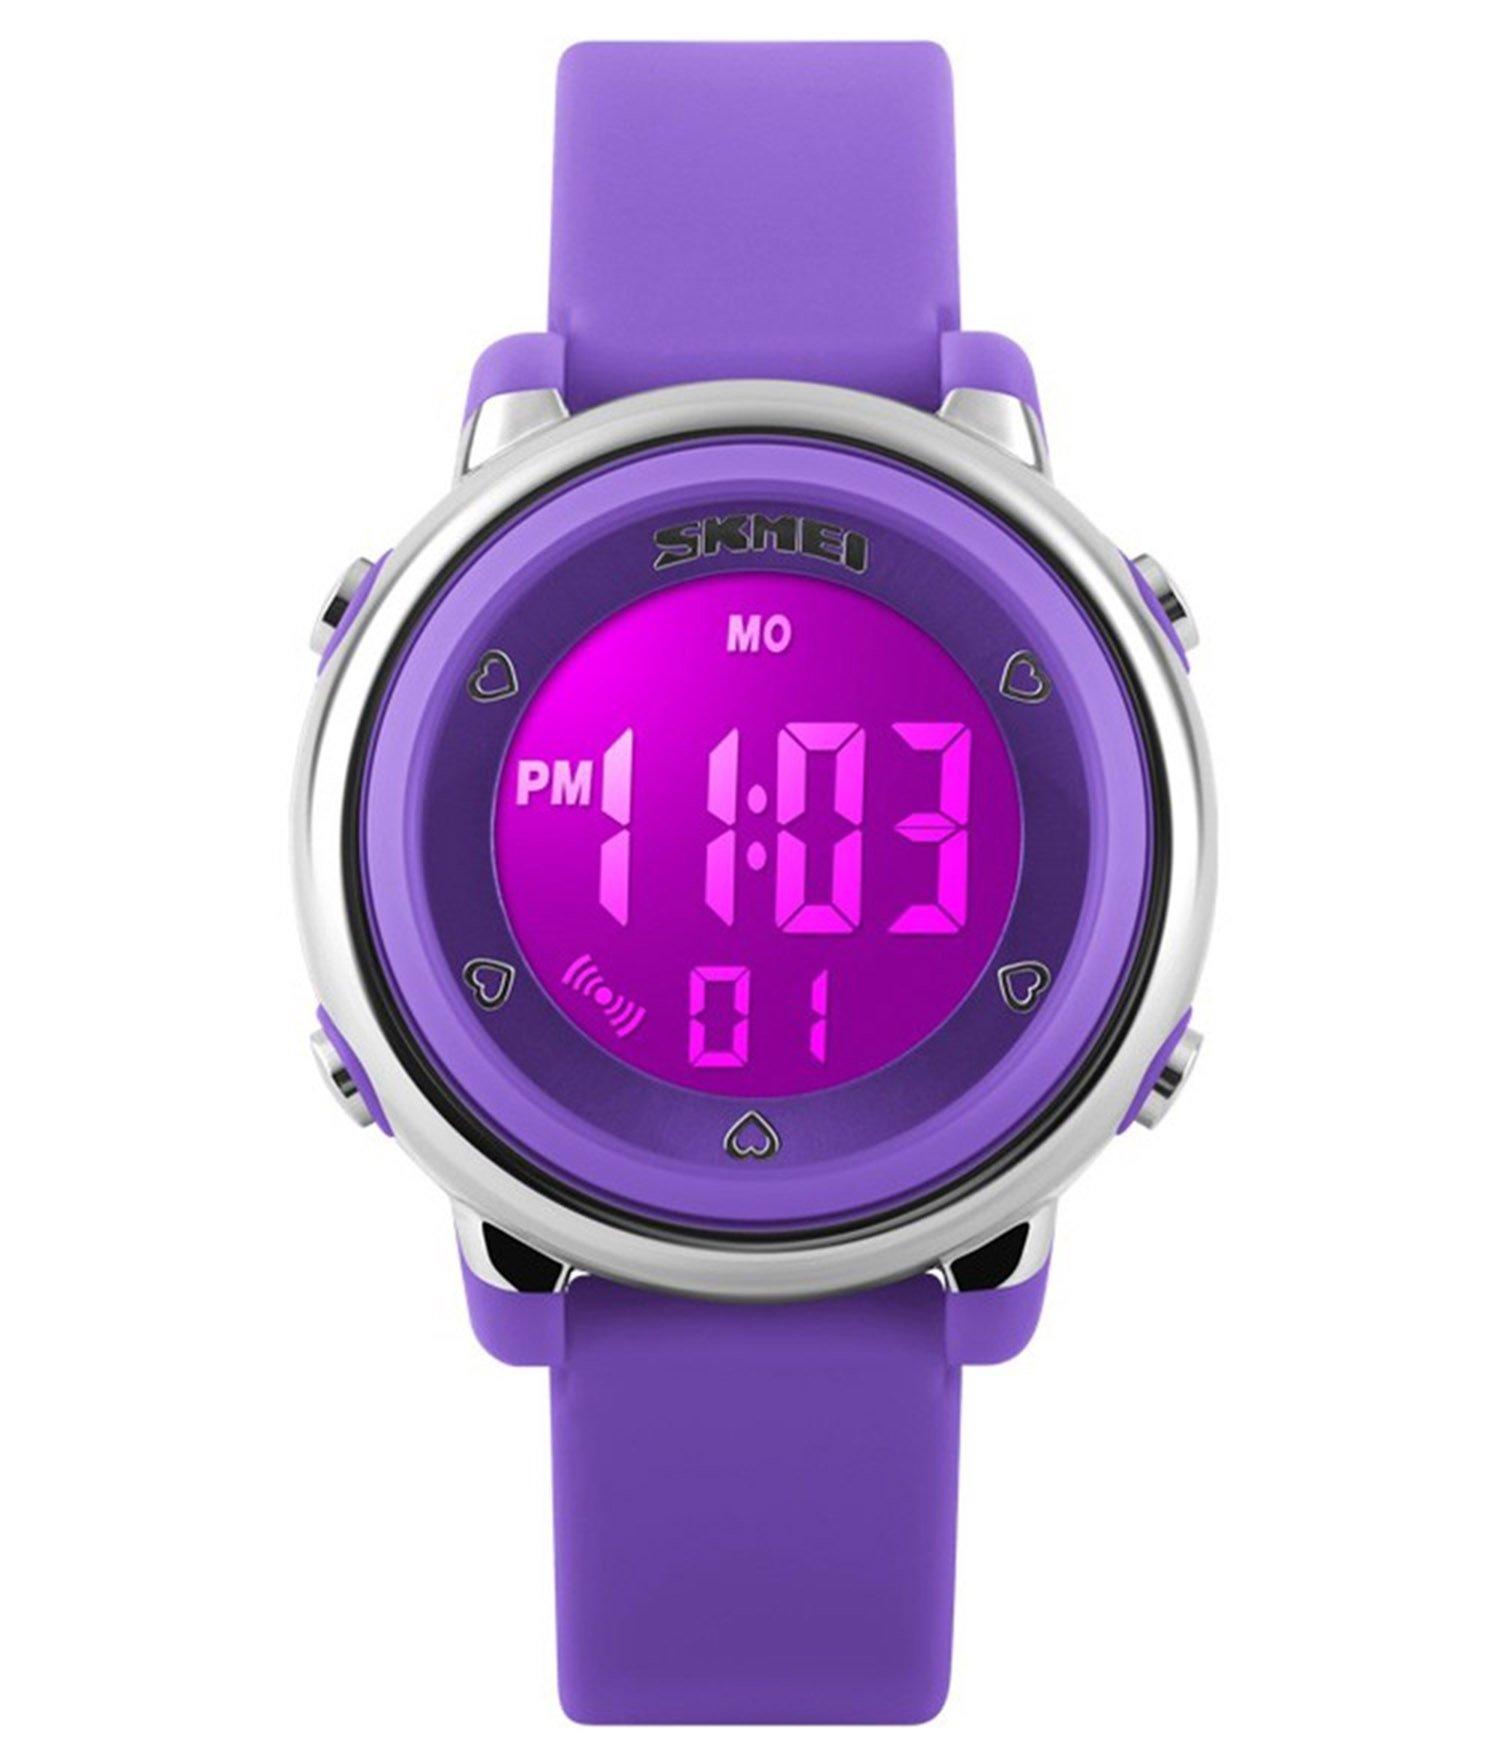 Fanmis Children Digital Display Purple Silicone Band LED Screen Waterproof Quartz Watch